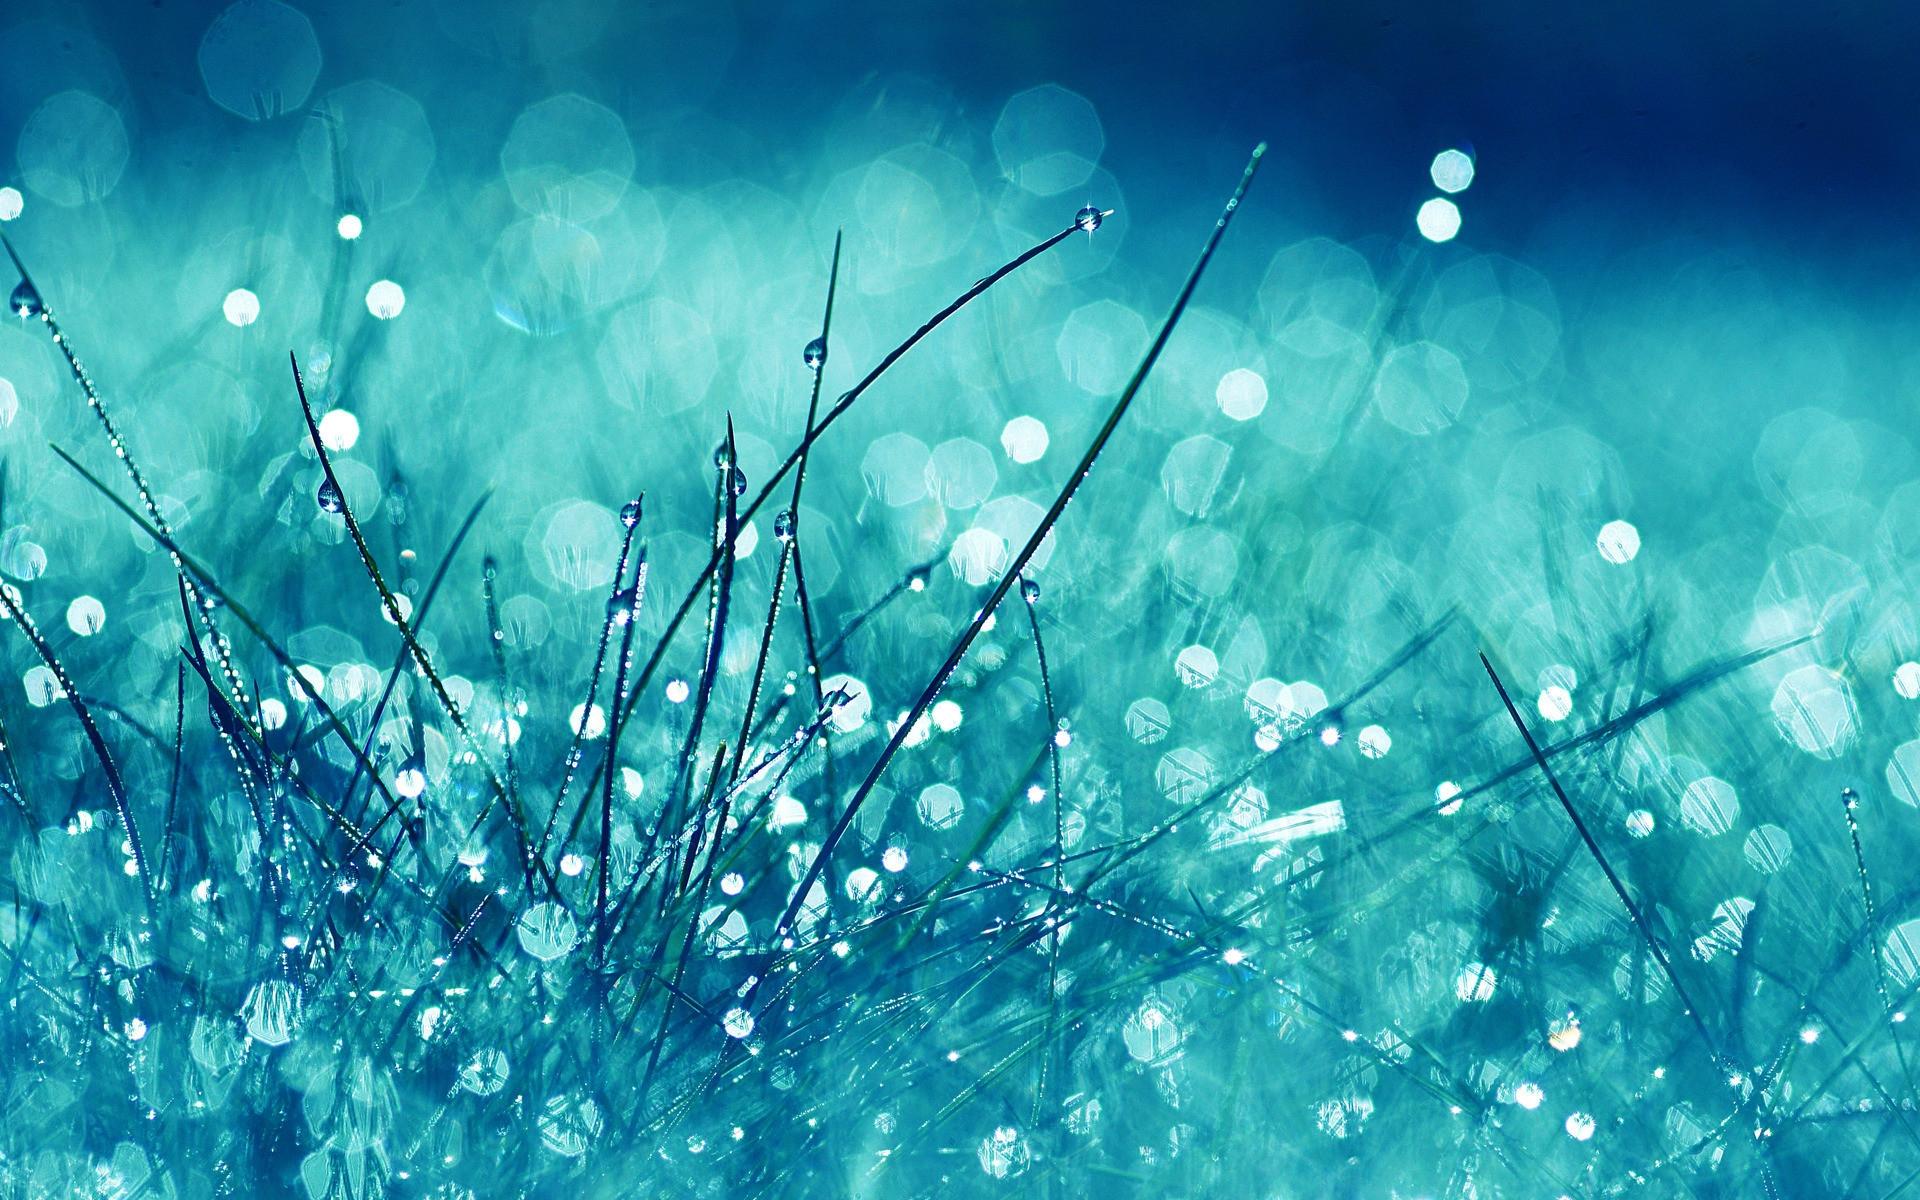 Wallpaper Grass Glare Glitter Light Bright 1920x1200